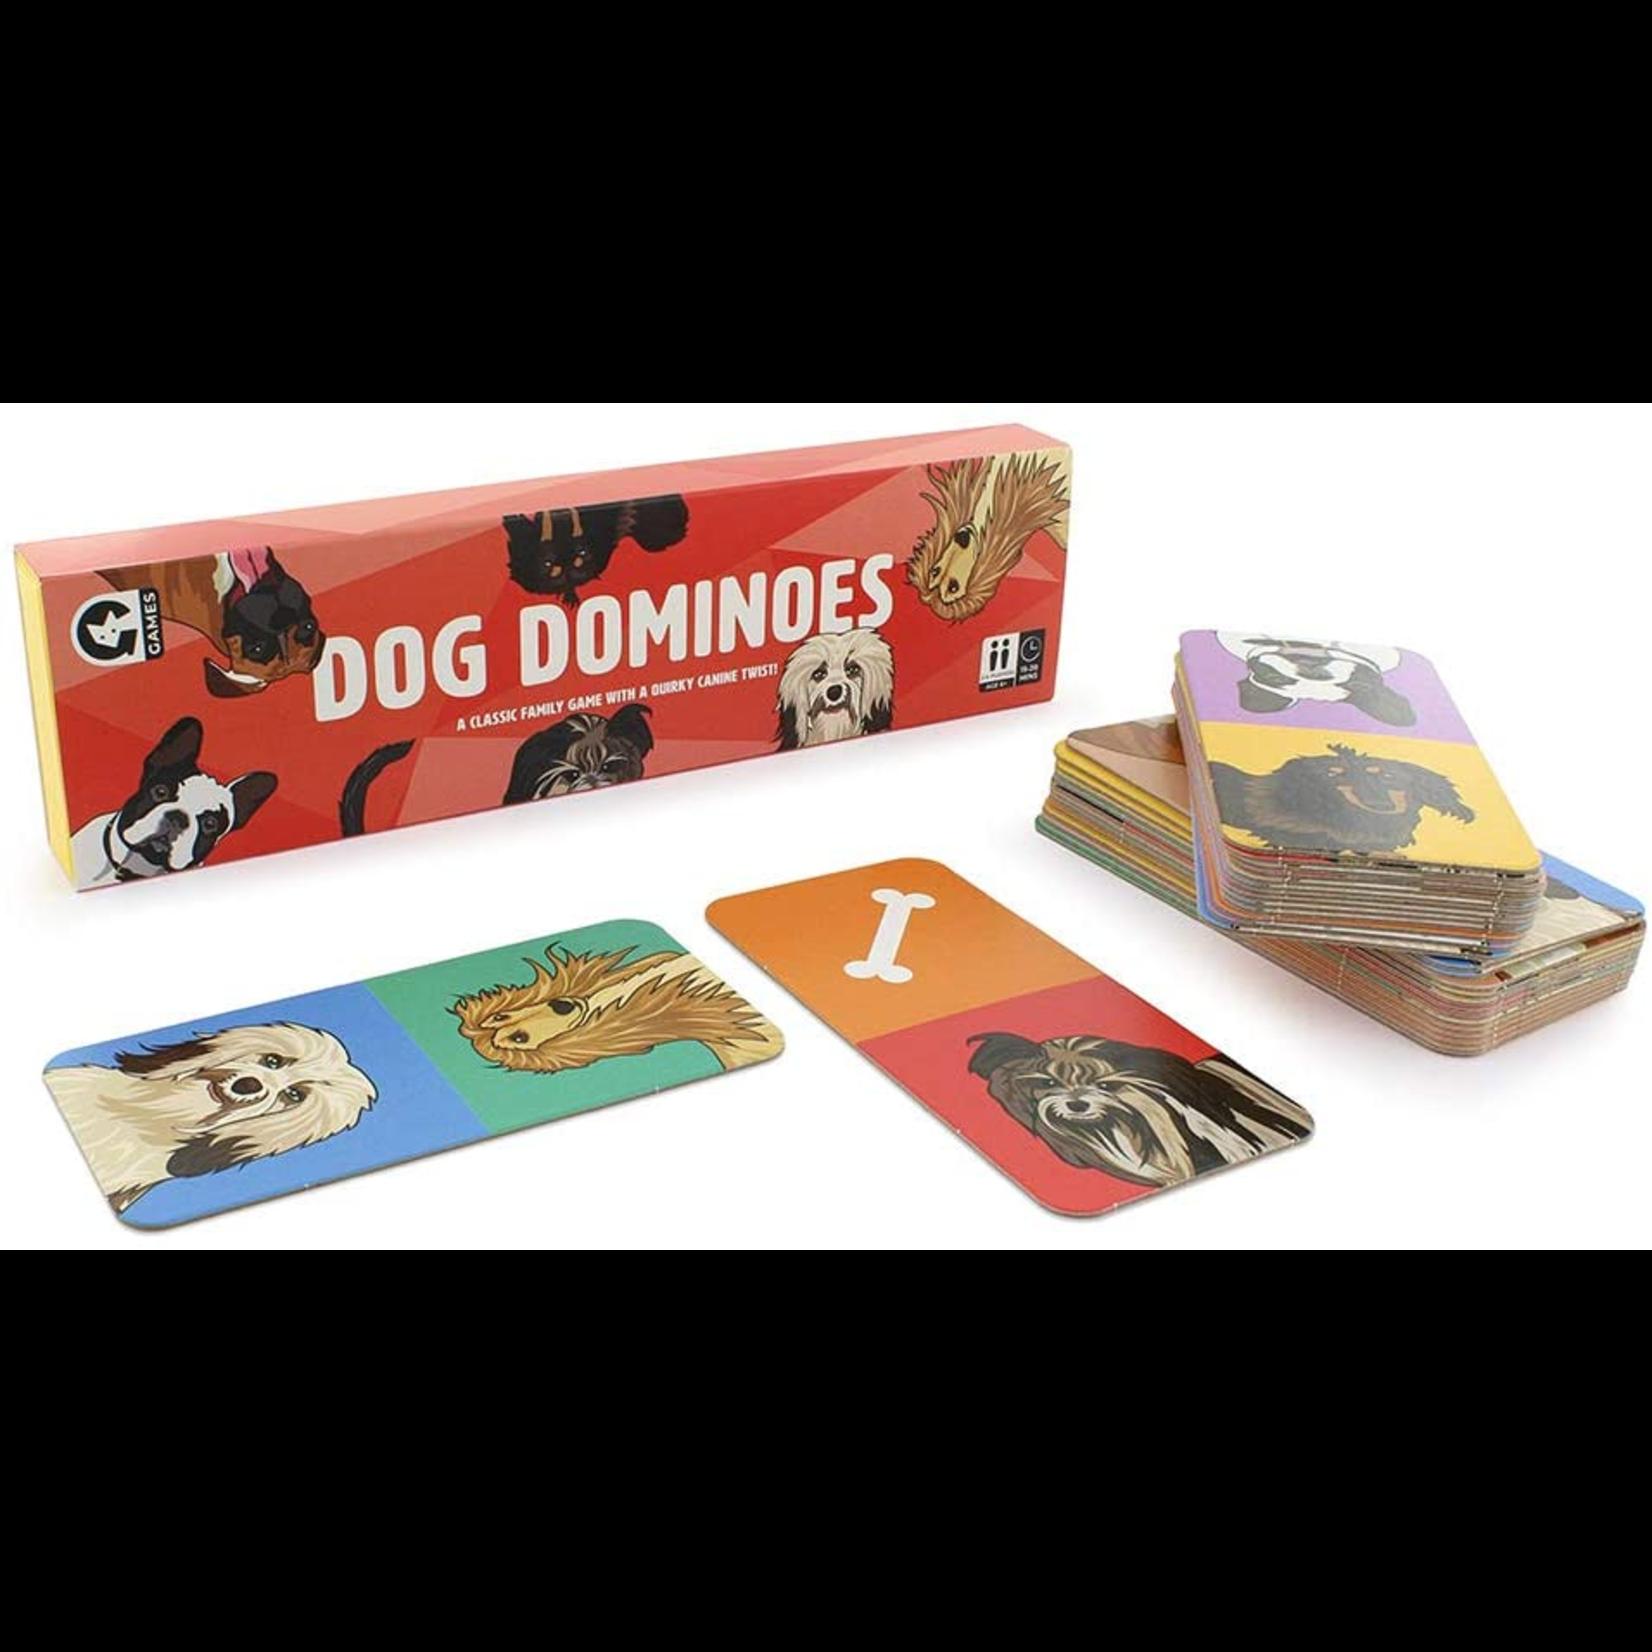 Ginger Fox Pet Dog Dominoes